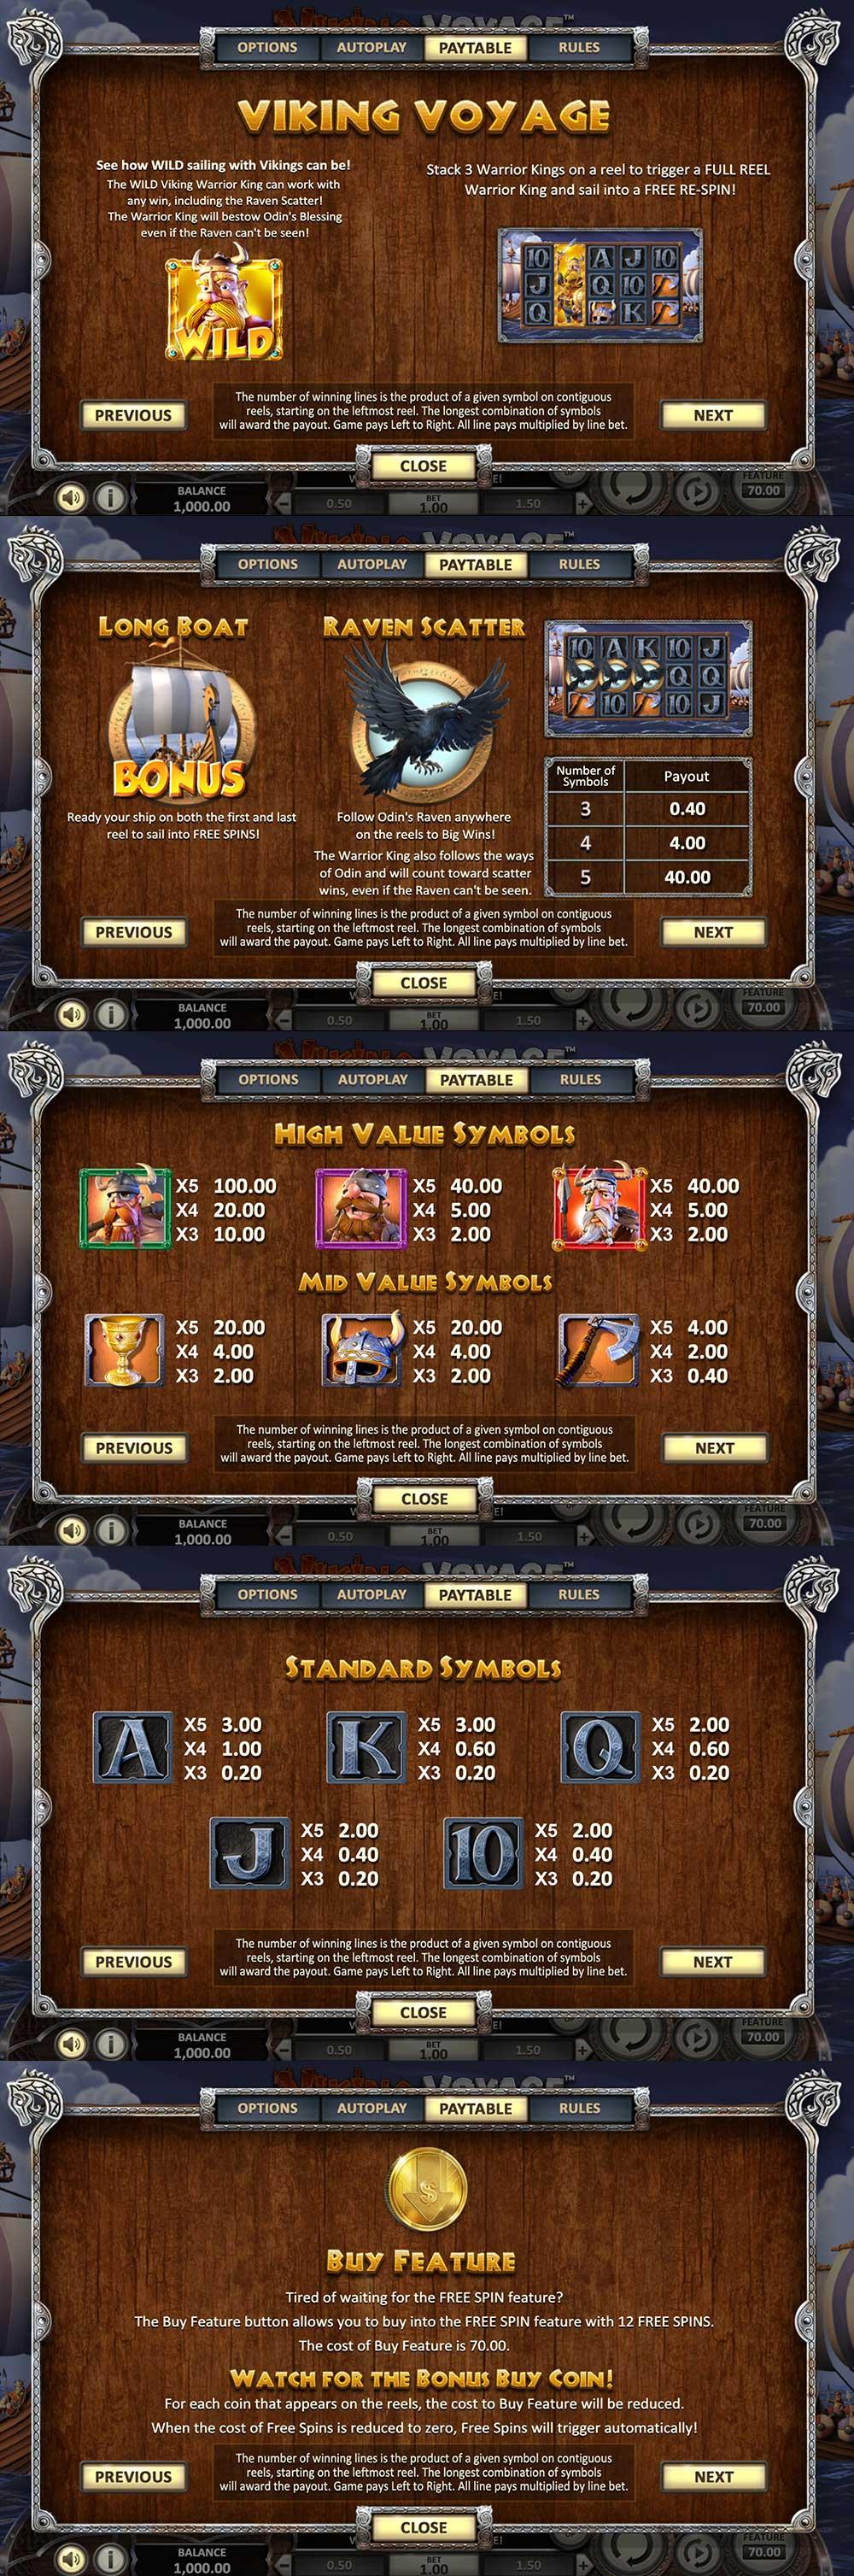 Viking Voyage Pay Table Screenshot, Big Dollar Casino